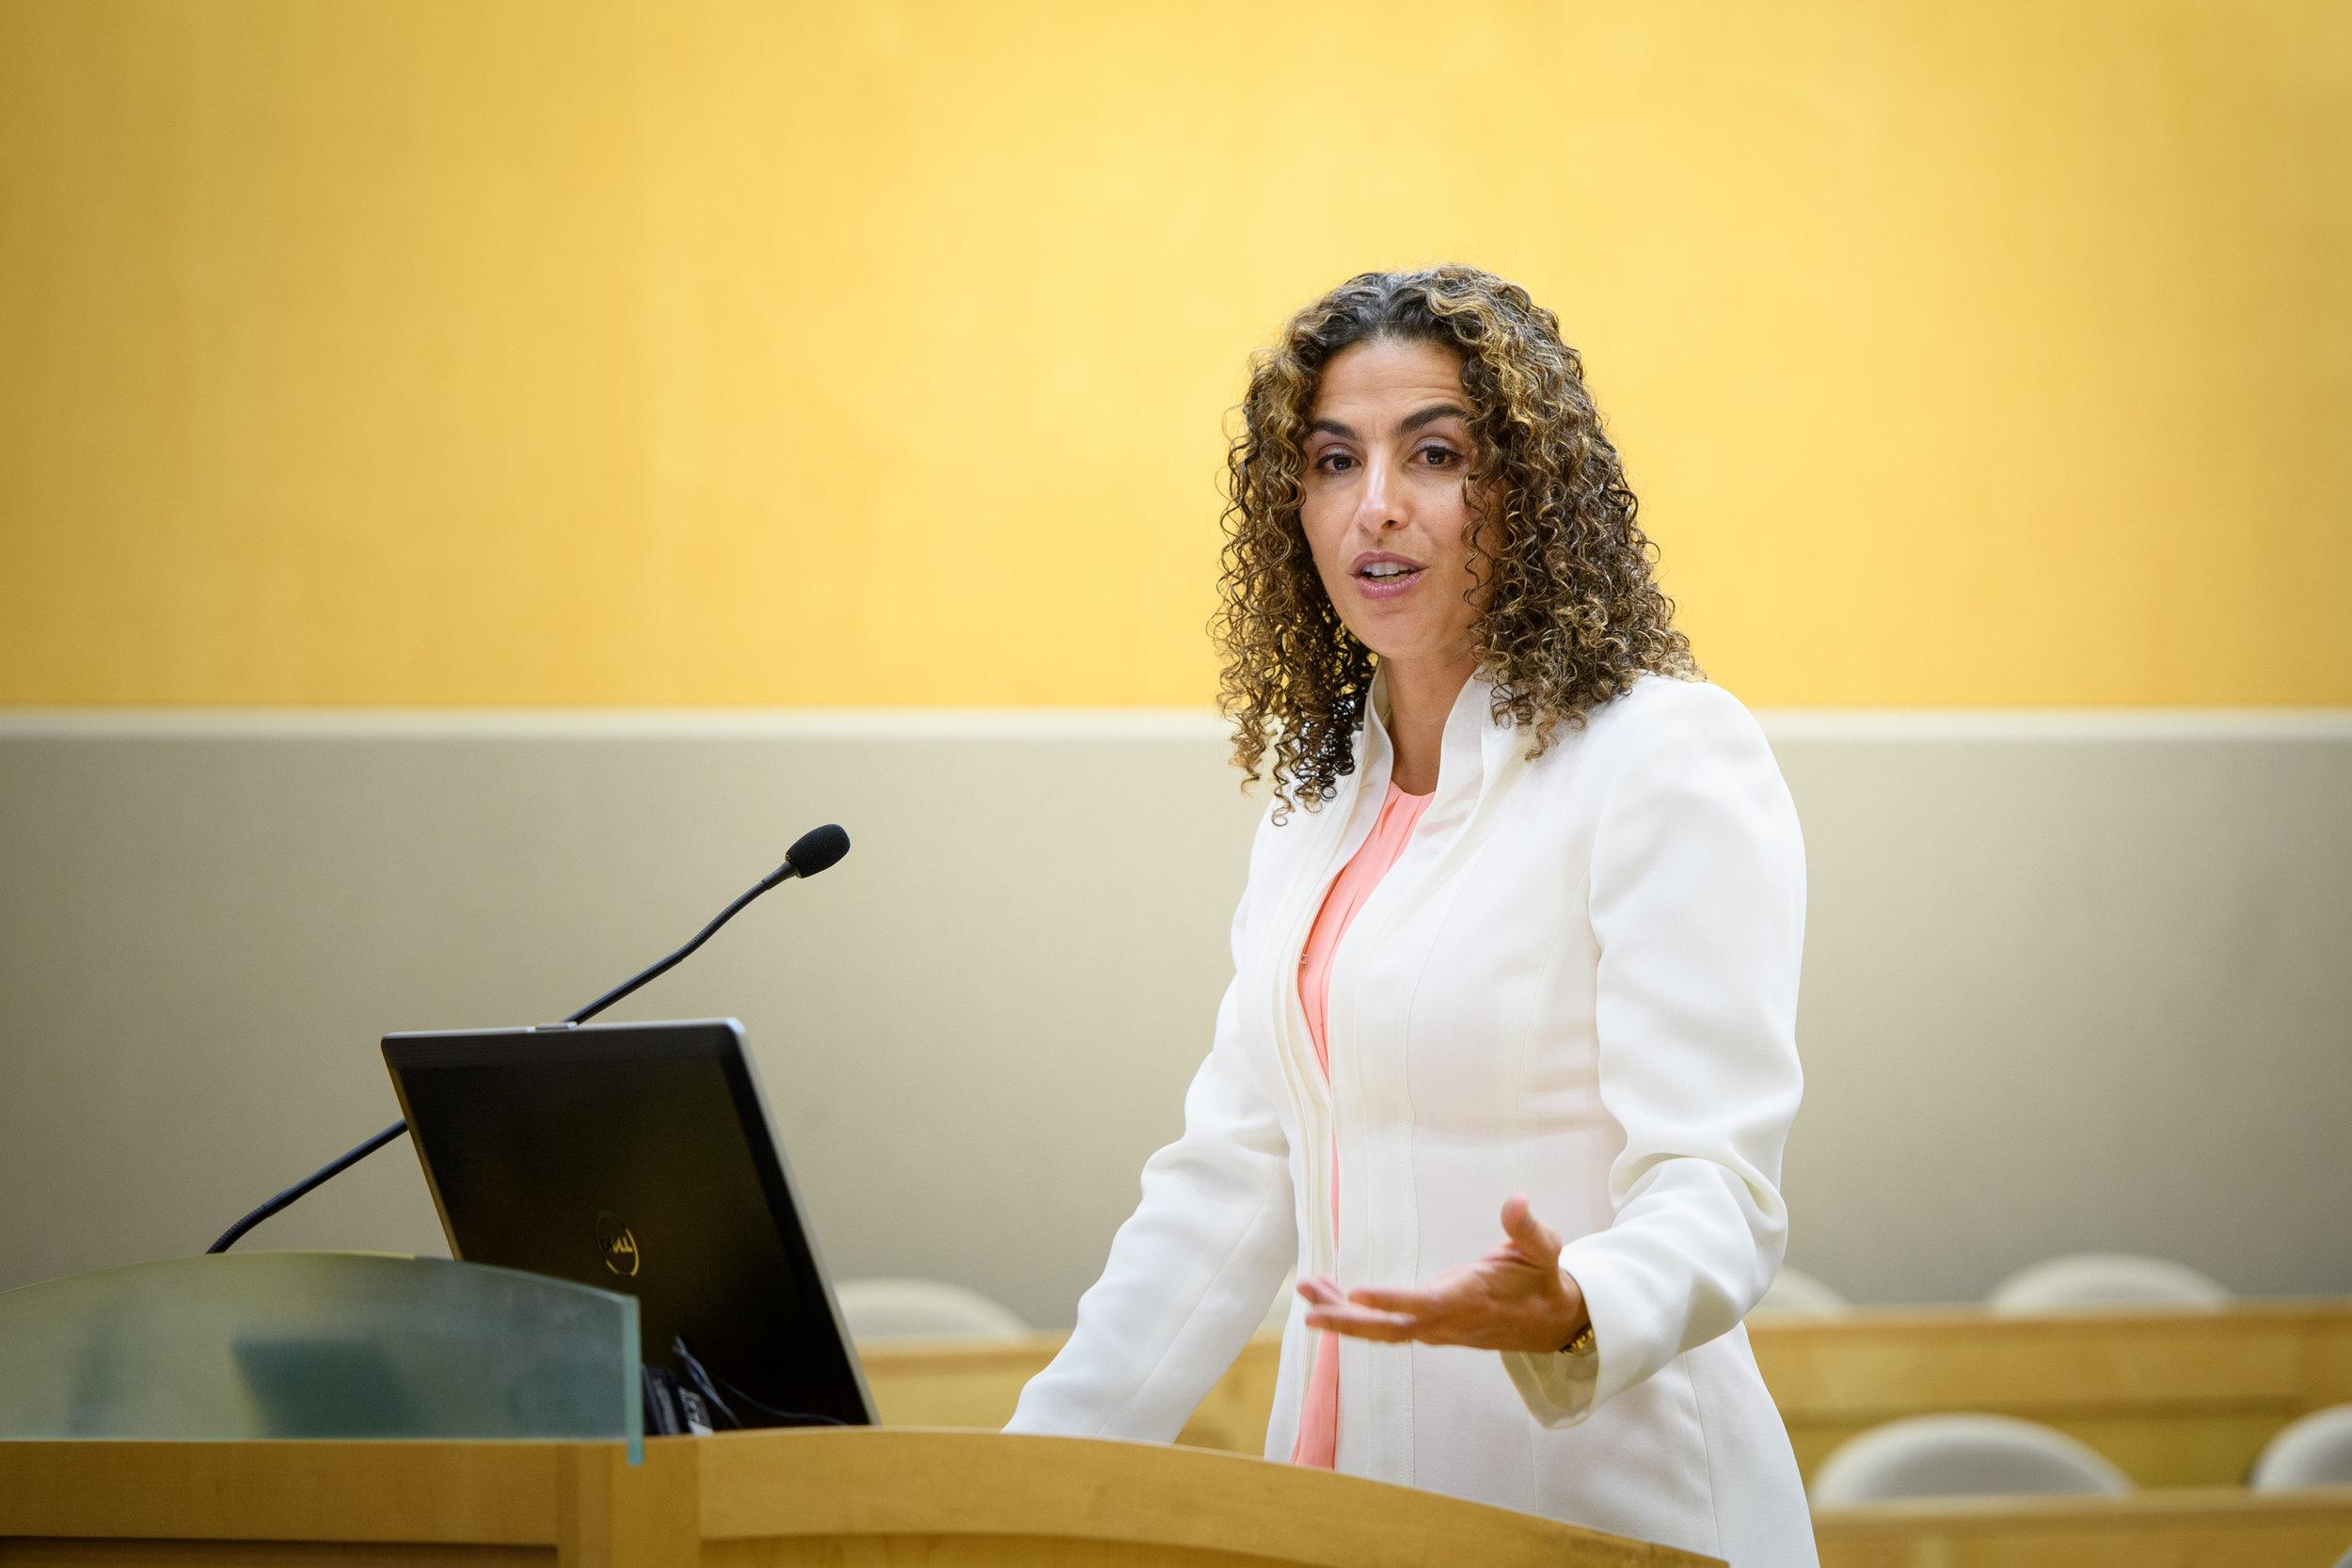 09-15-16 buck fanklin lecture Sahar Aziz-125.jpg